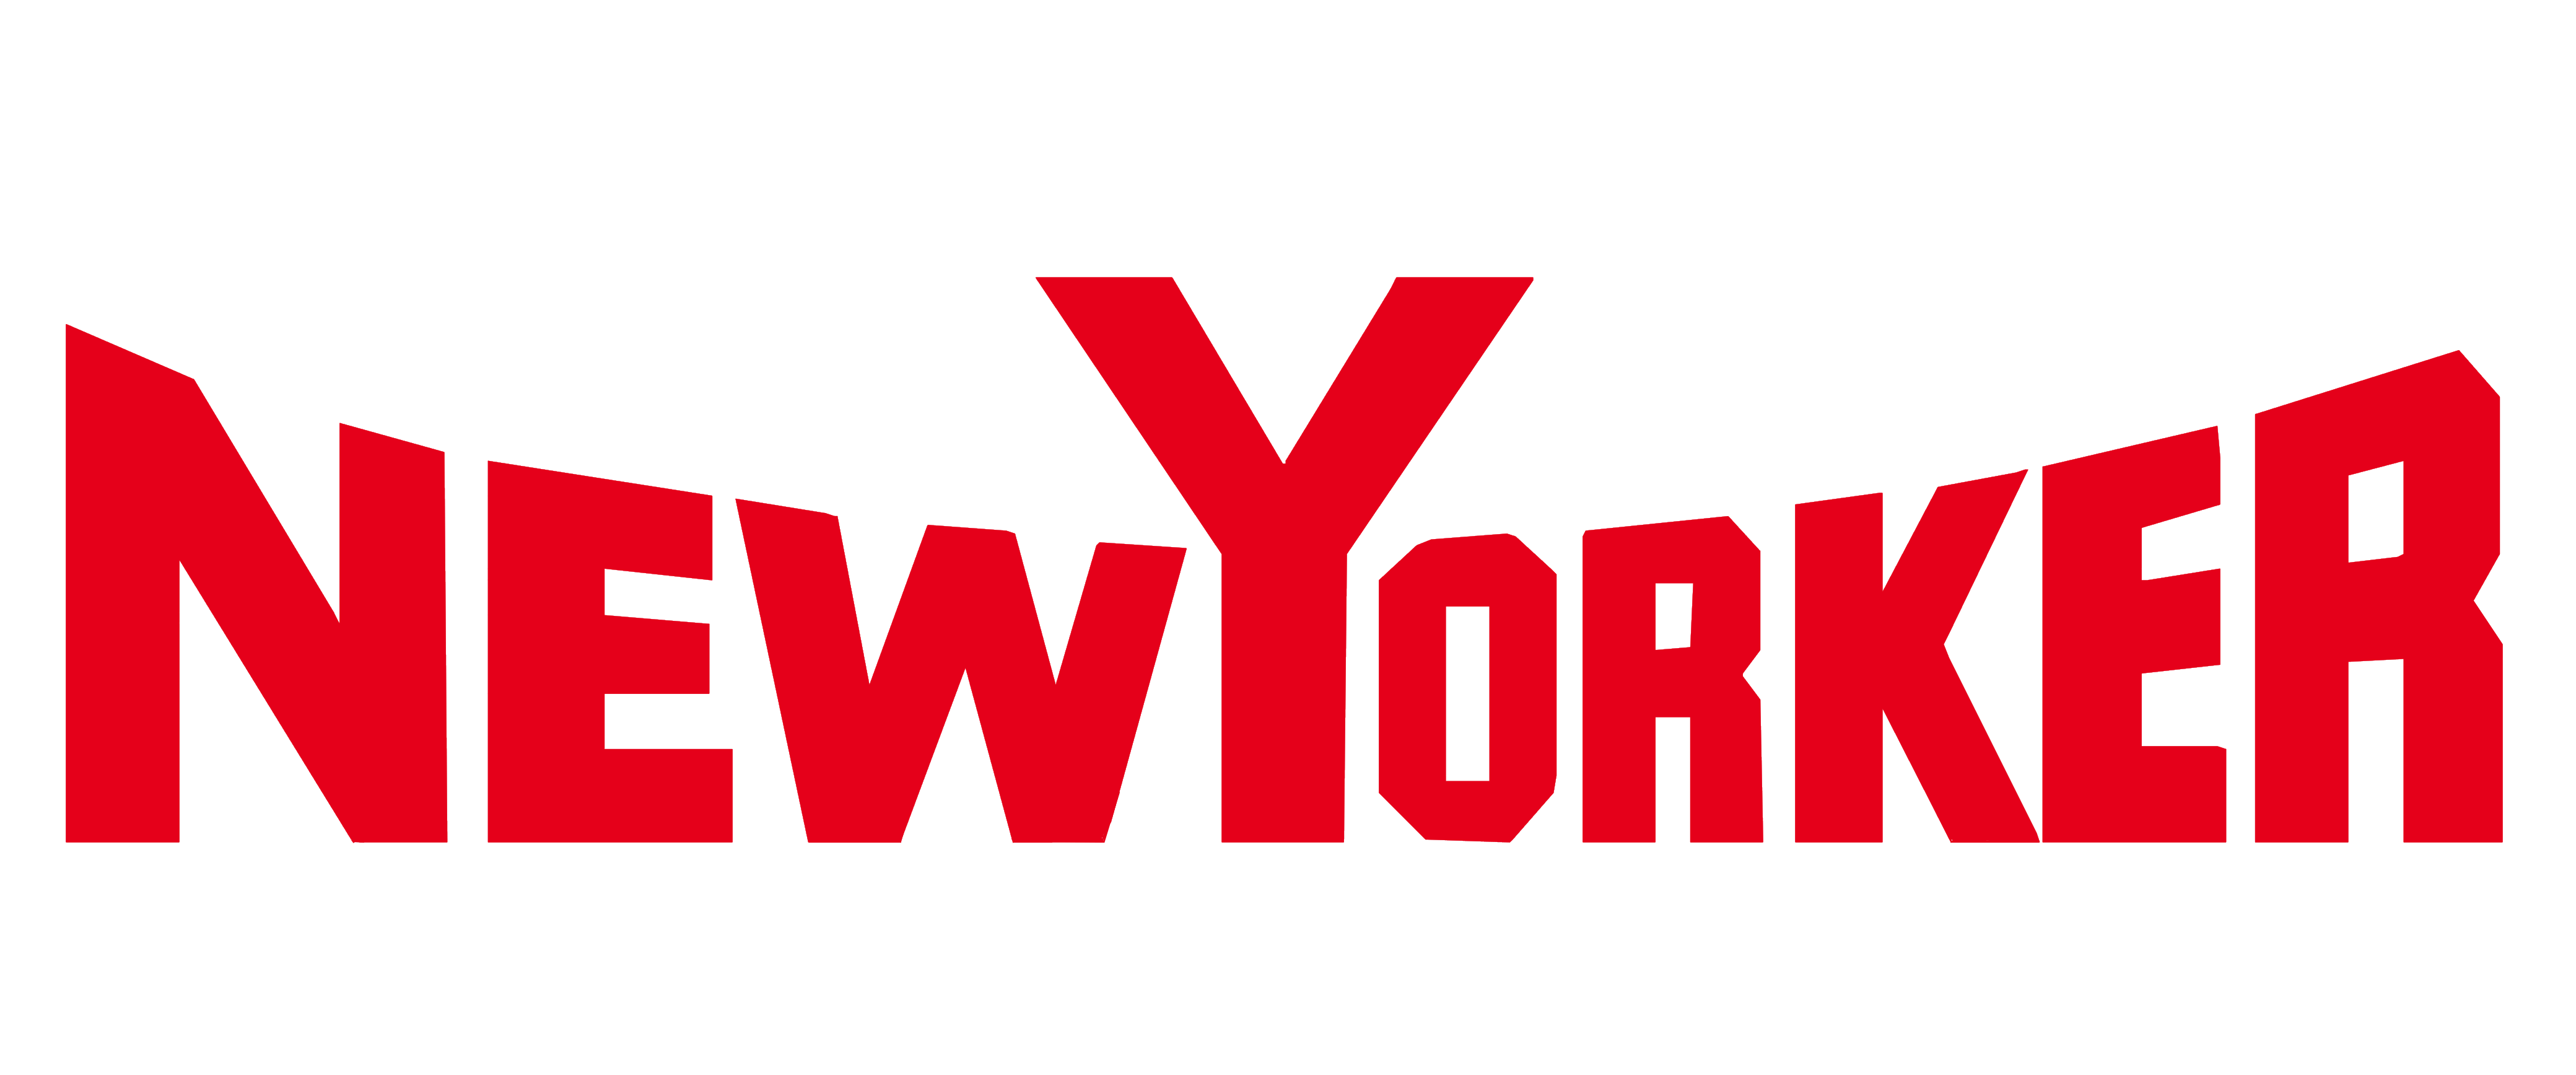 New Yorker logo (NewYorker) - Newyorker PNG